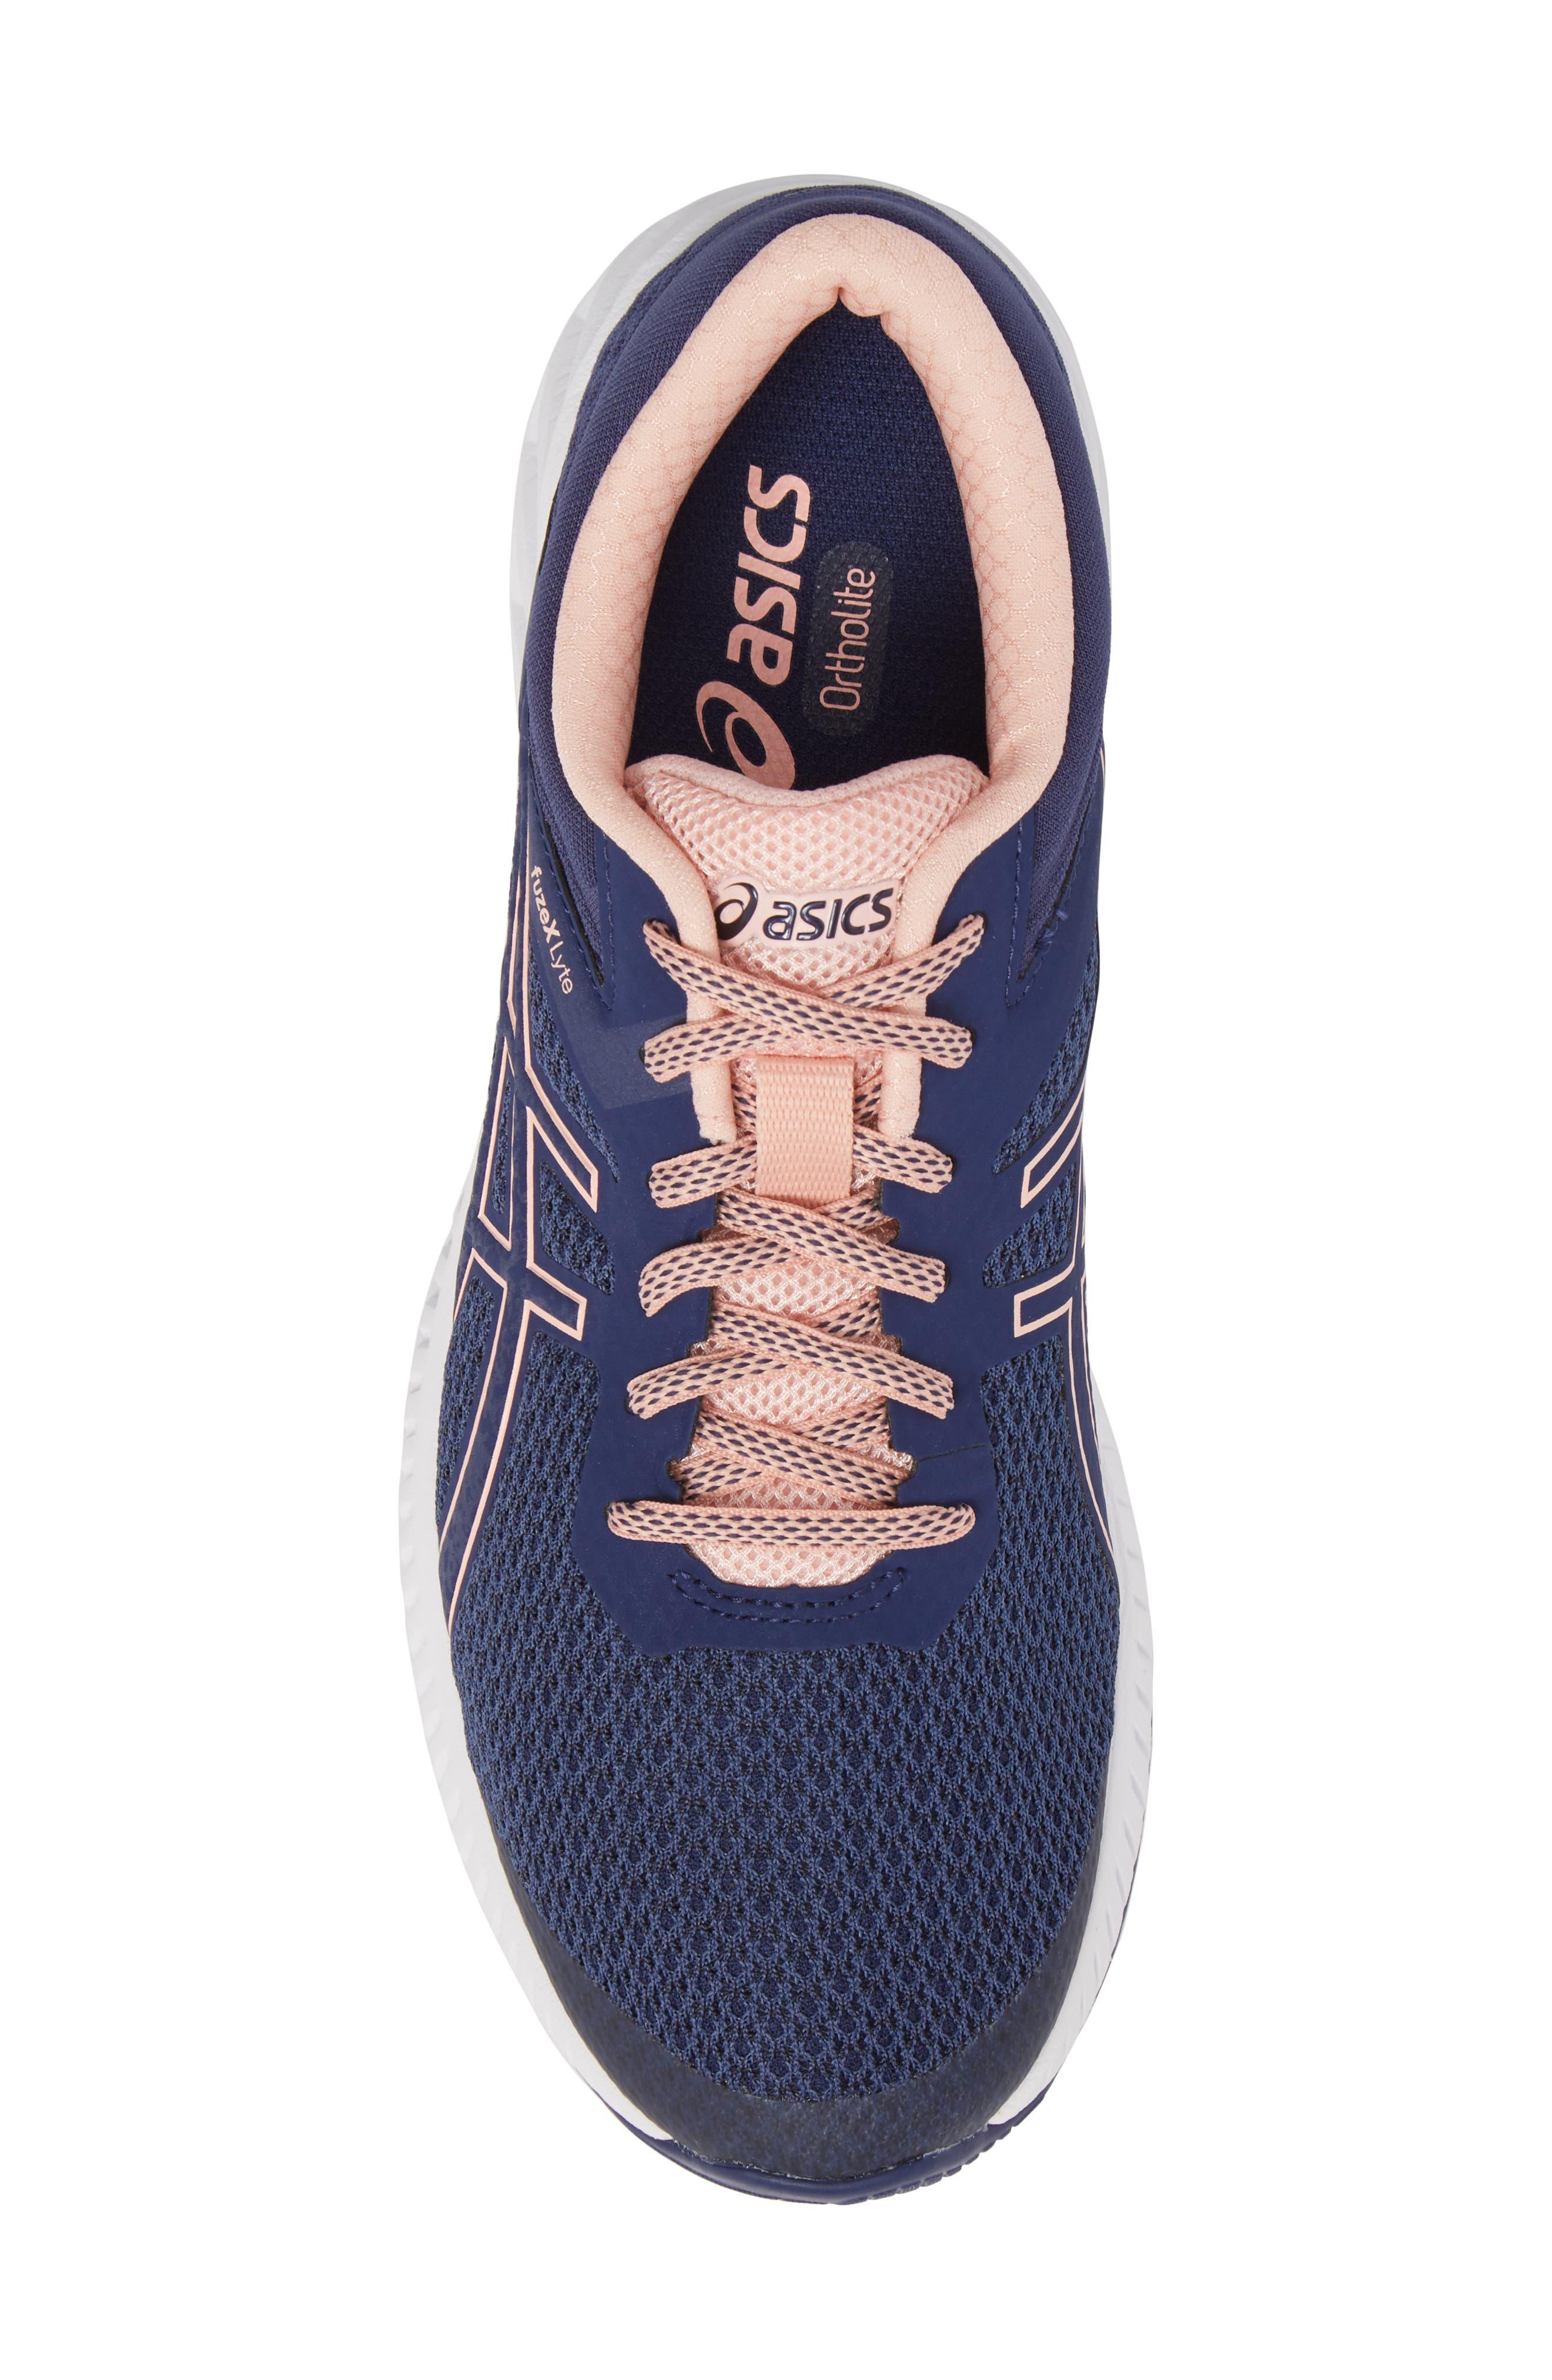 FuzeX Lyte 2 Running Shoe,                             Alternate thumbnail 5, color,                             INDIGO BLUE/ FROSTED ROSE